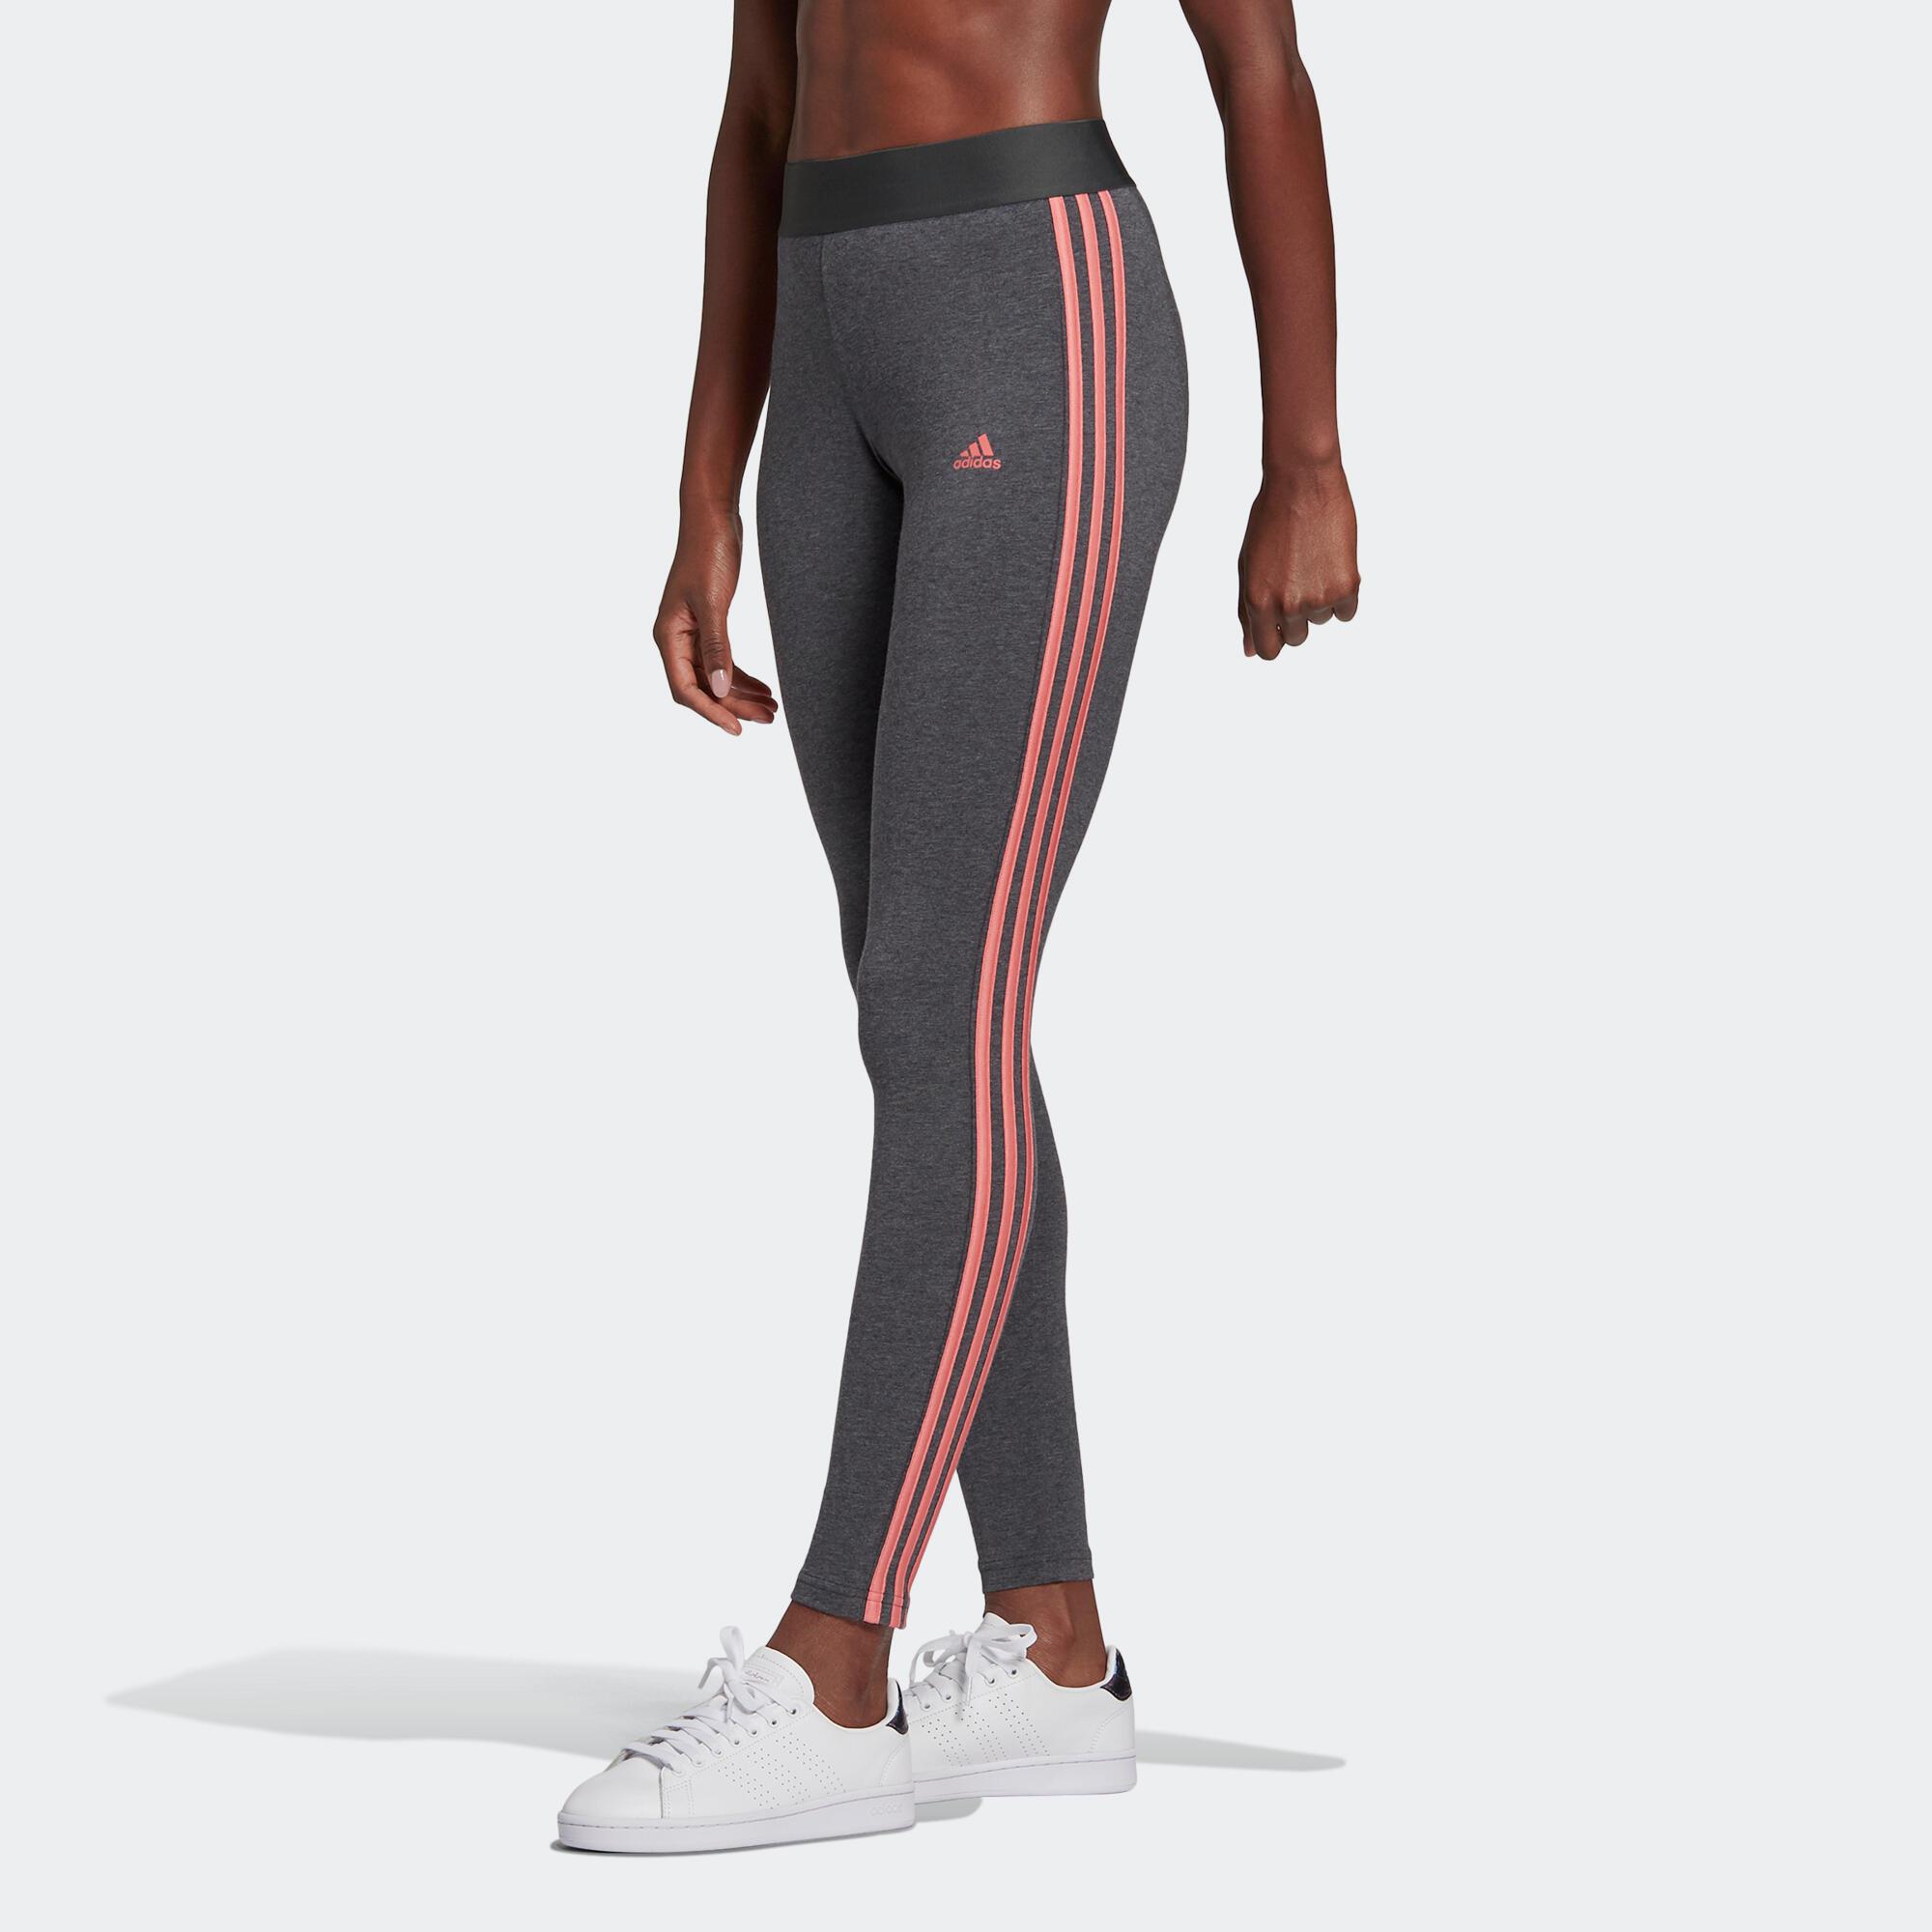 Colanți Adidas Fitness Damă imagine